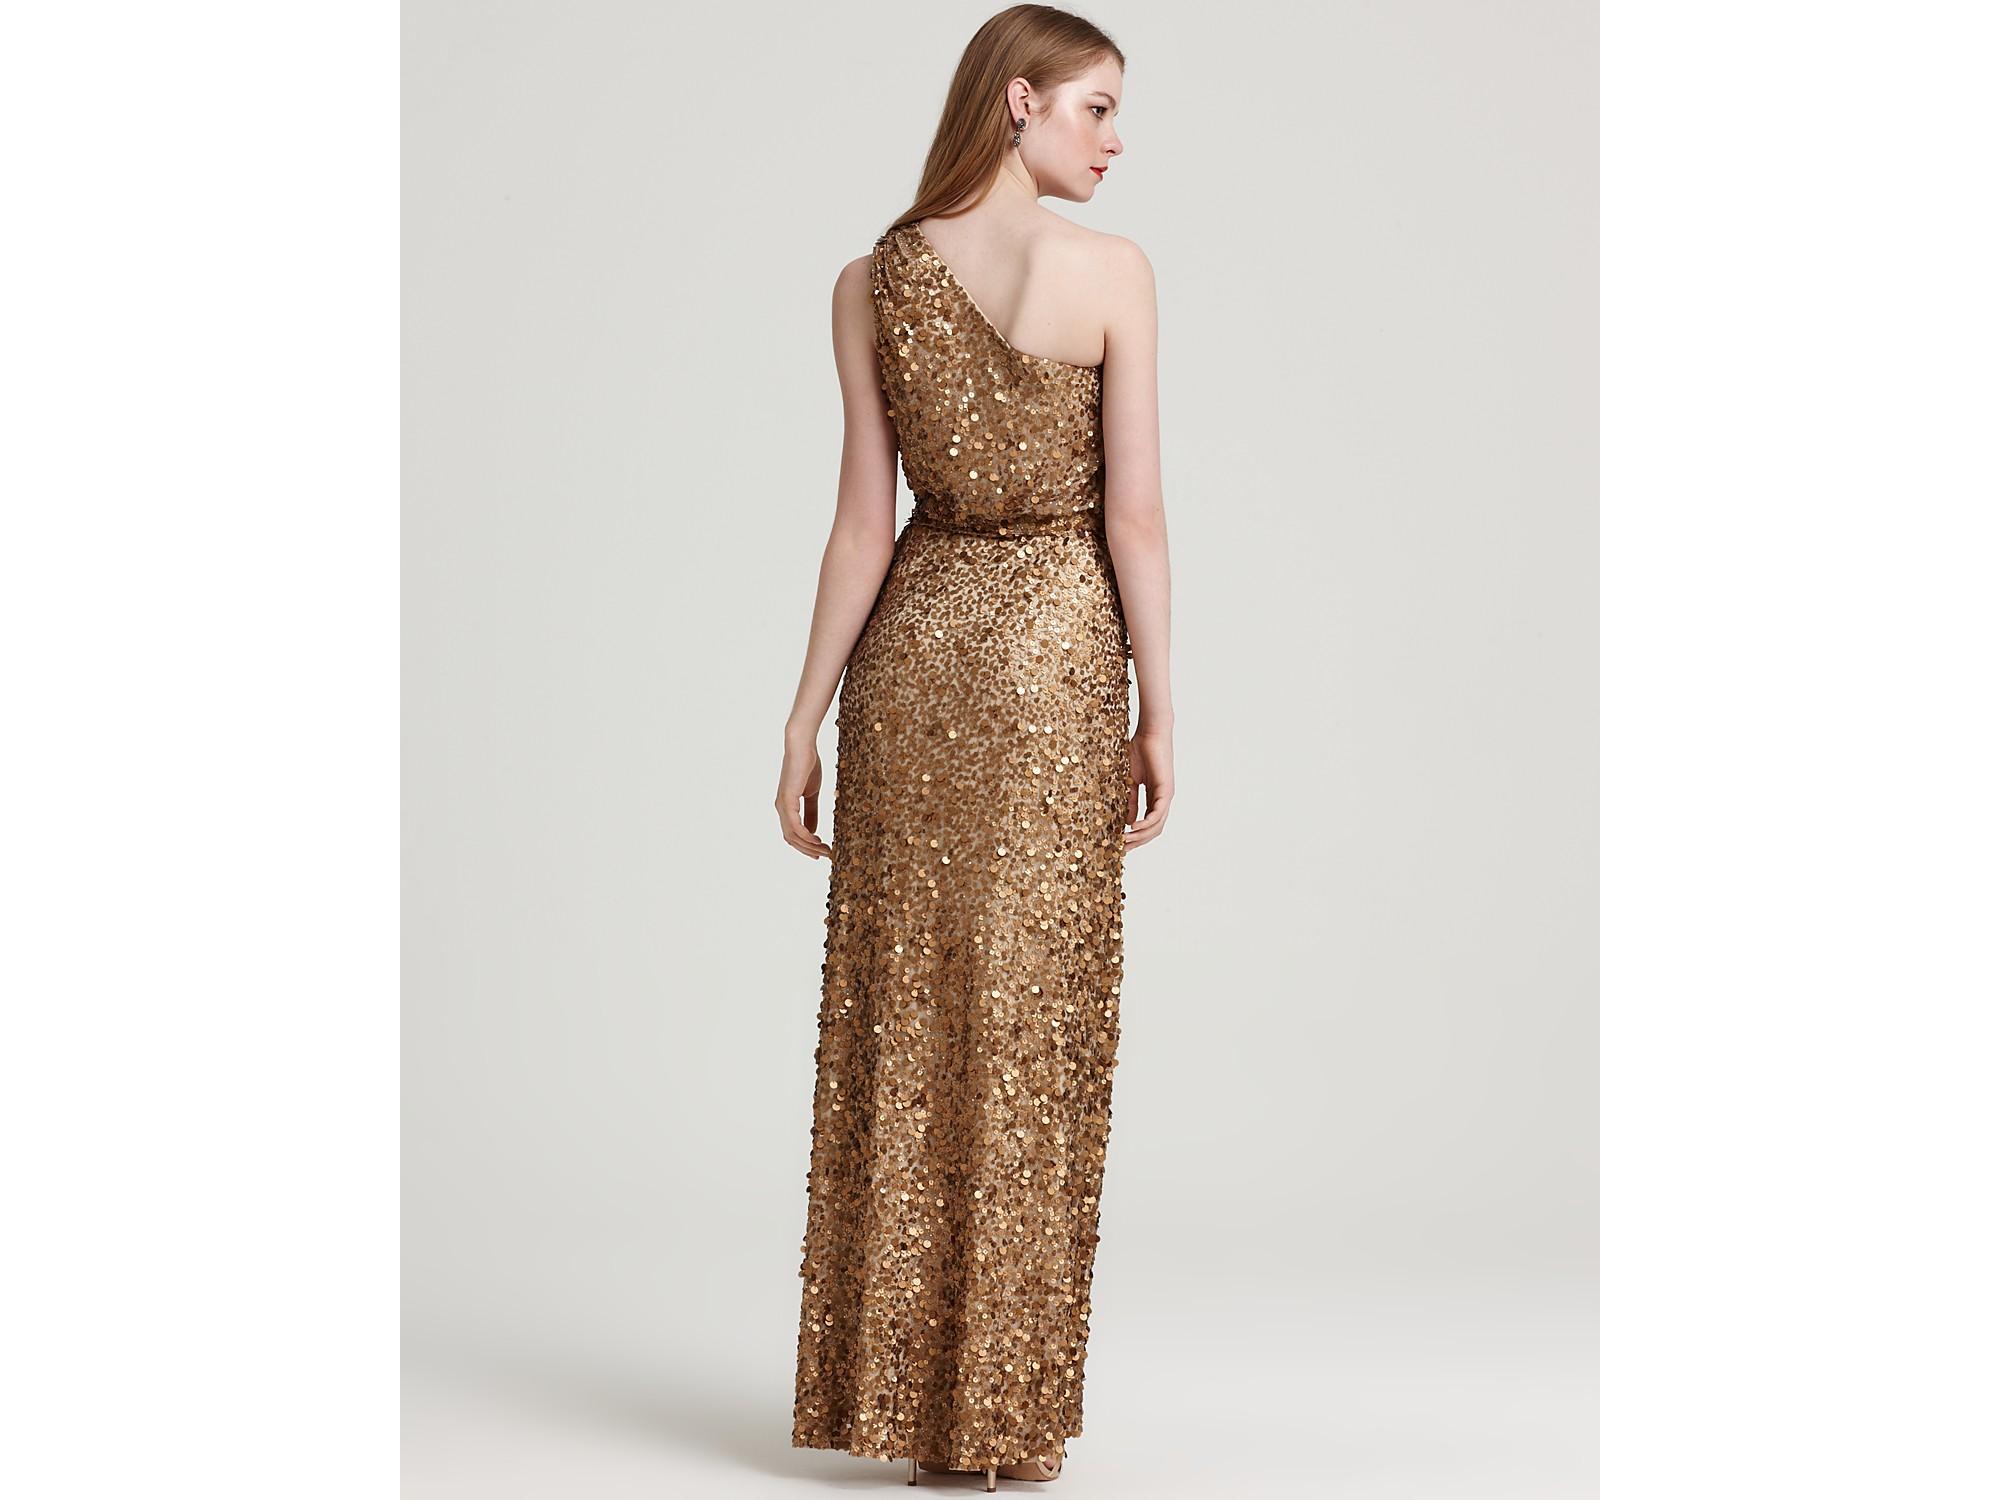 Aidan mattox Sequin Dress One Shoulder in Metallic | Lyst